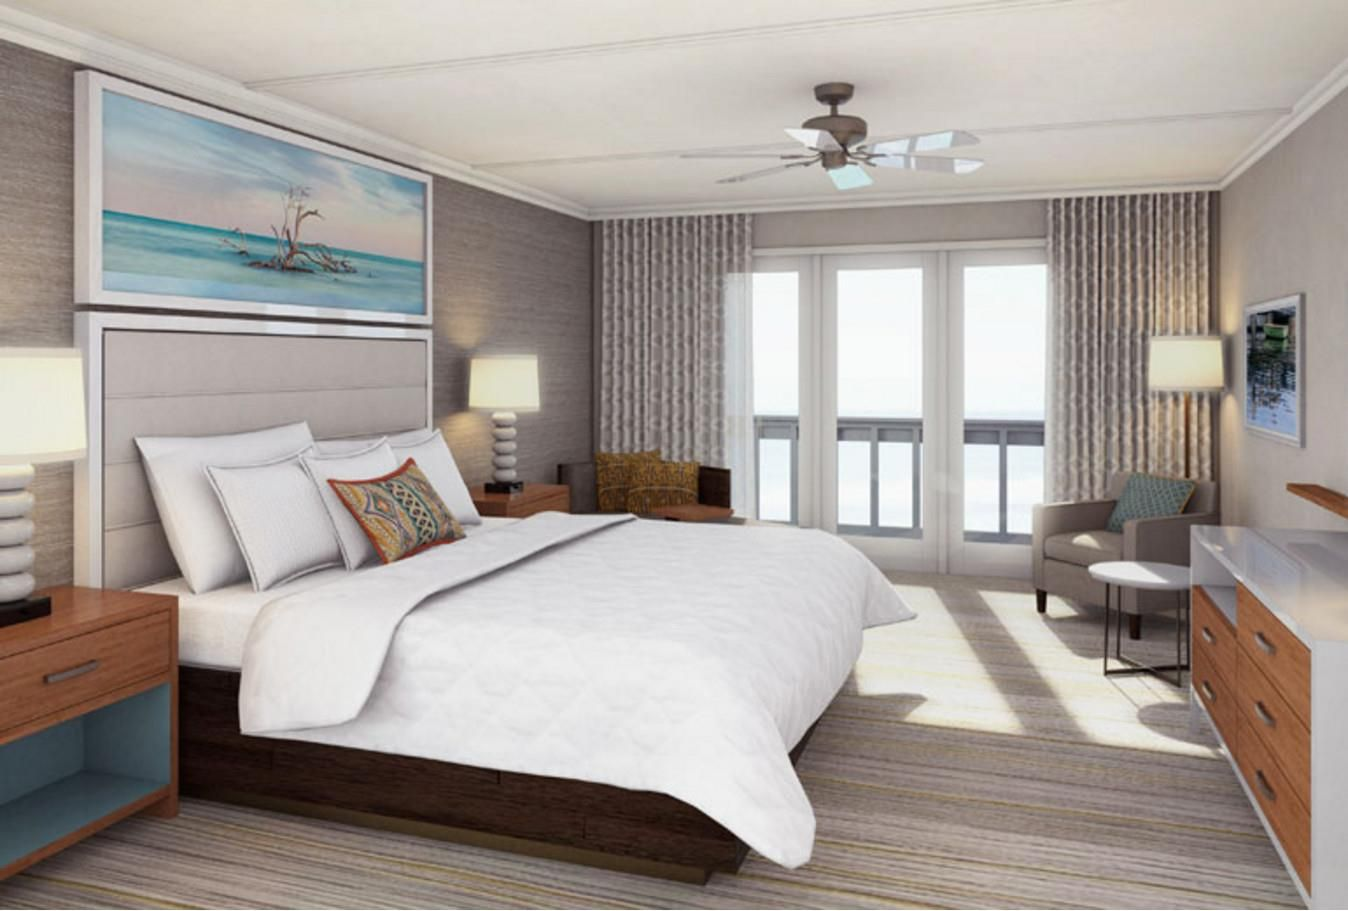 Sheraton Bay Point Resort Panama City (FL), United States